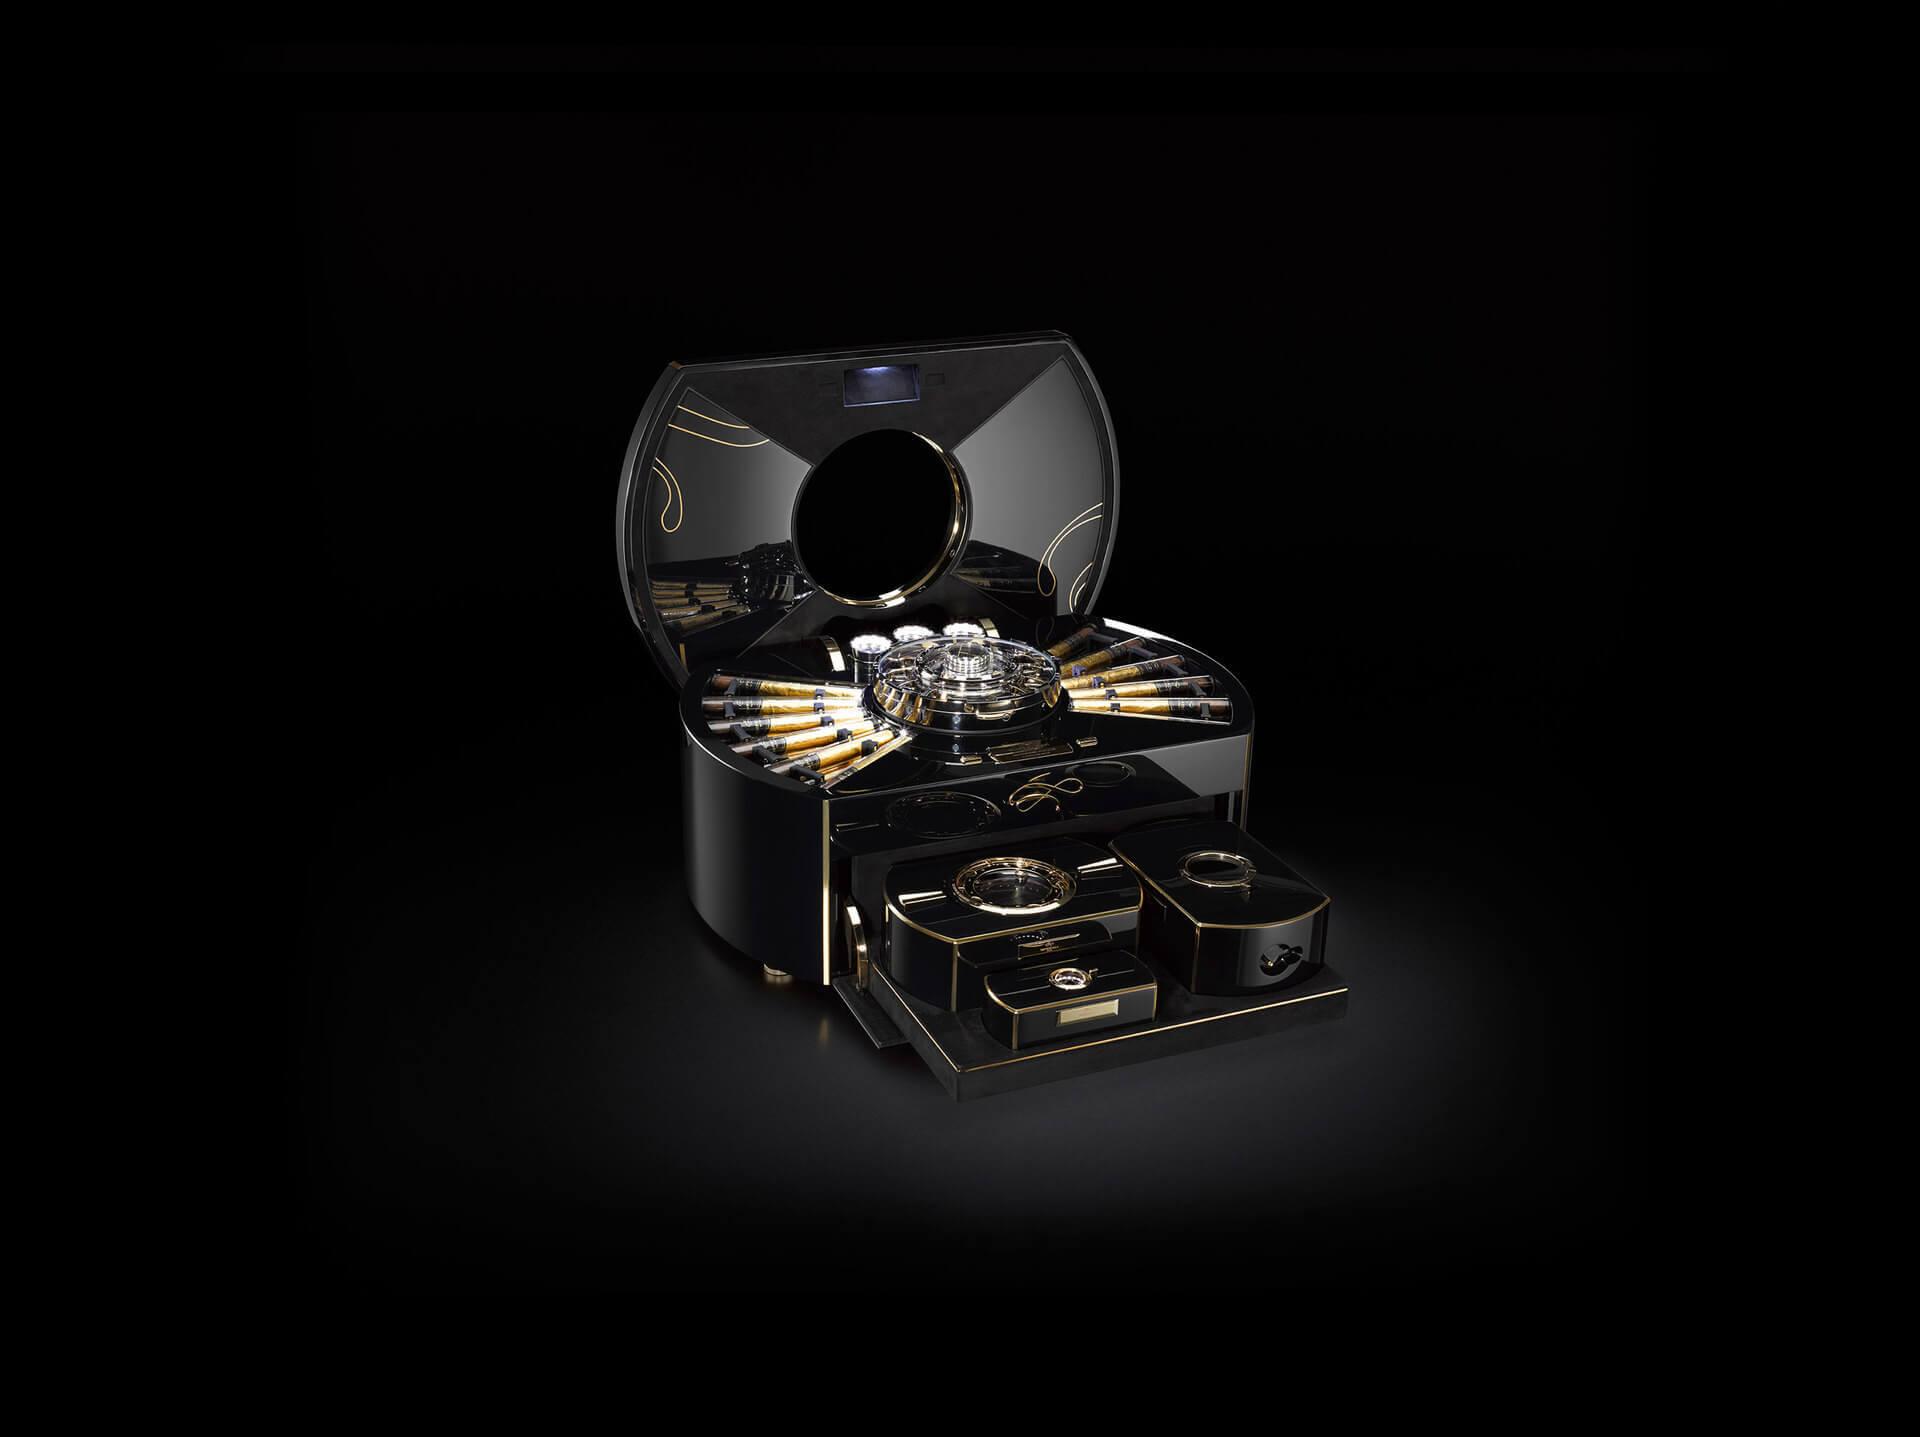 imperiali-geneve-emperador-cigares-cave-coupe-laser-tourbillon-luxe-design-horlogerie-effronté-05